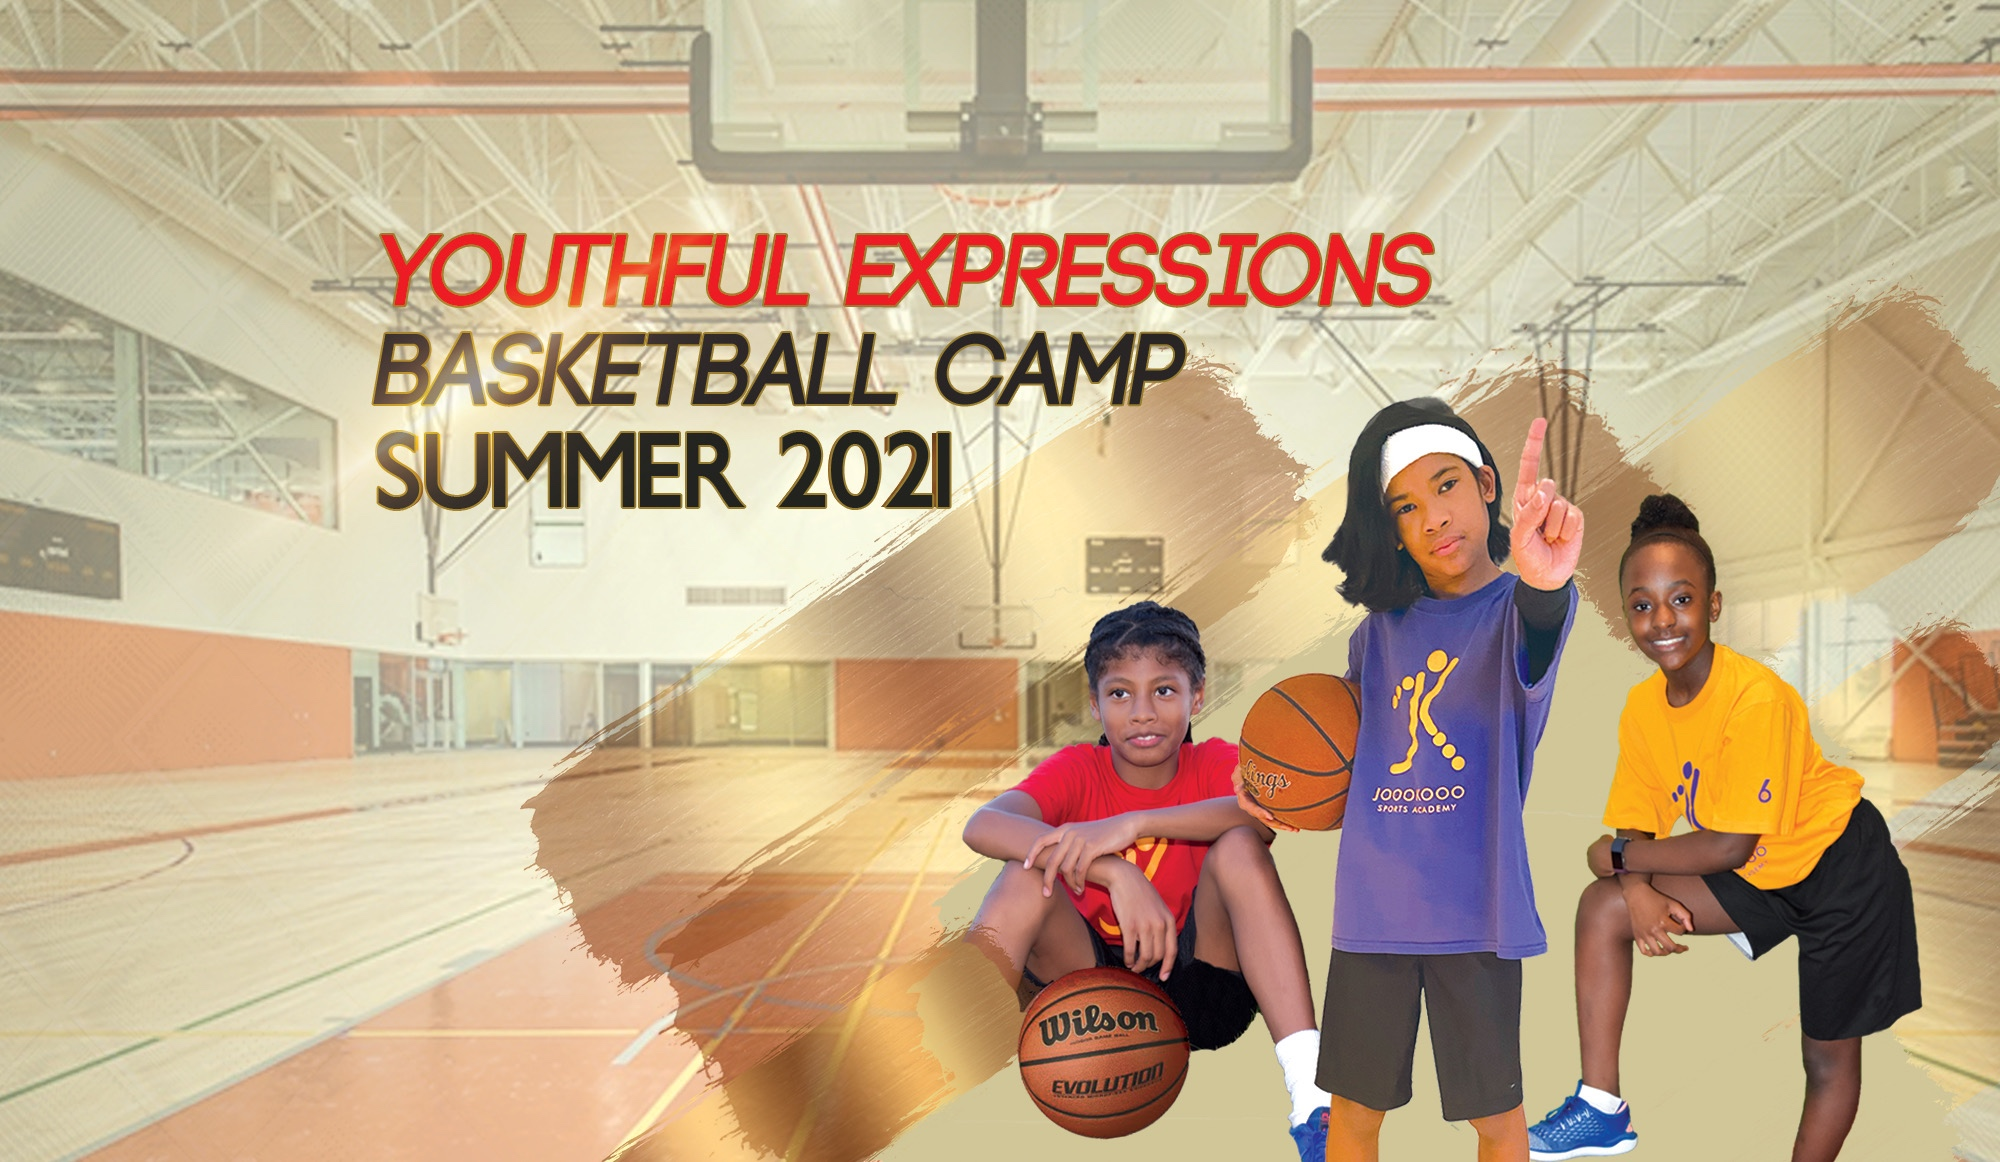 Joookooo Sports Academy free summer basketball camp starts July 5th